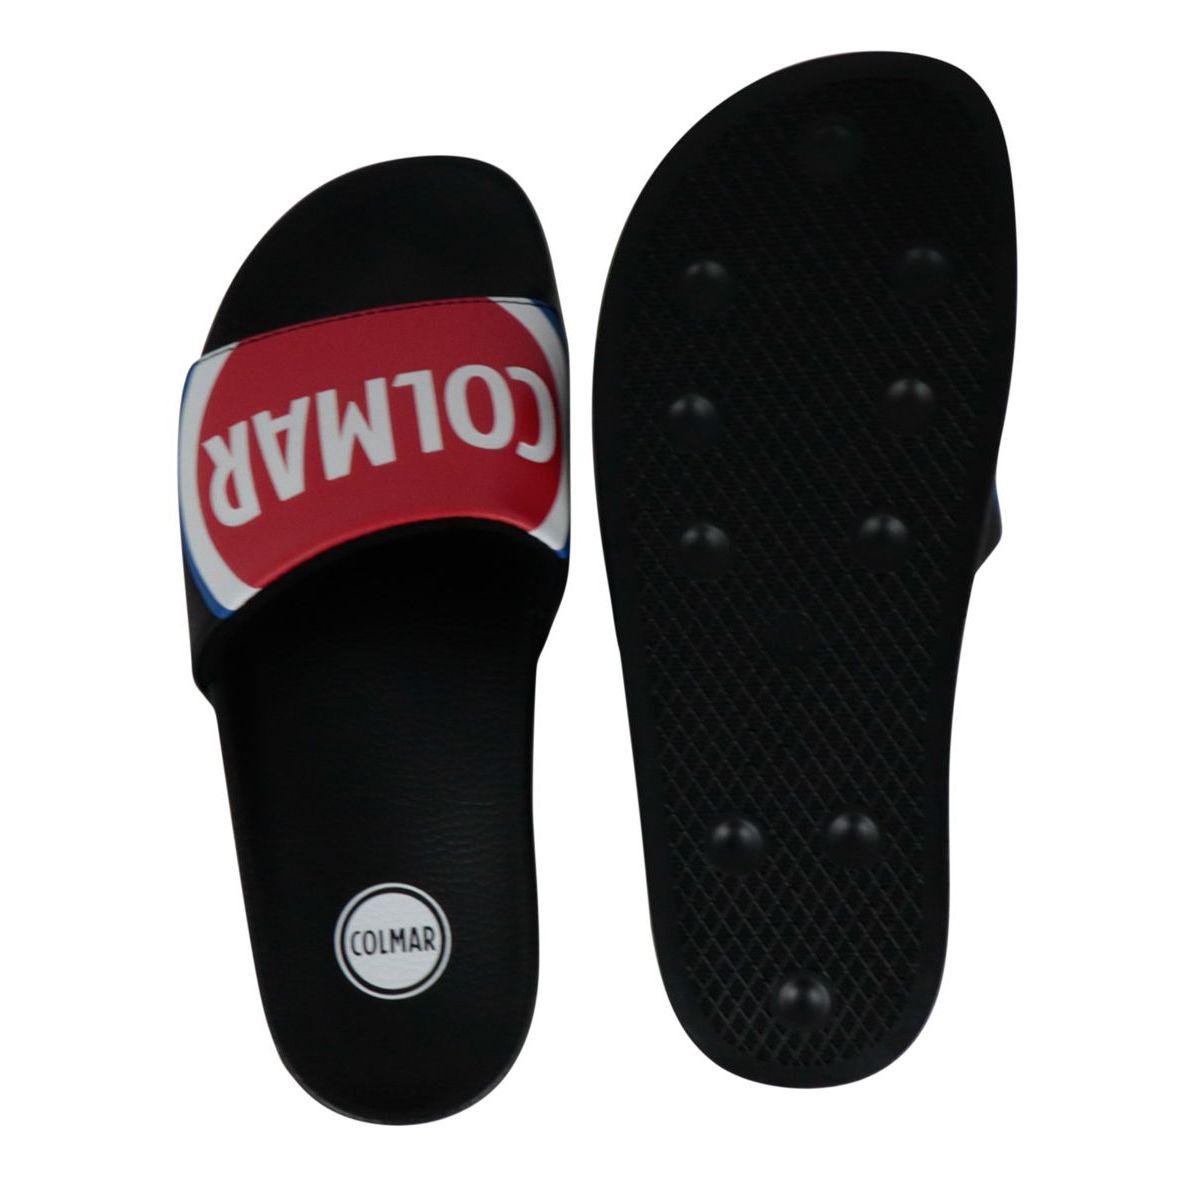 Beach slipper with logo Black Colmar Shoes